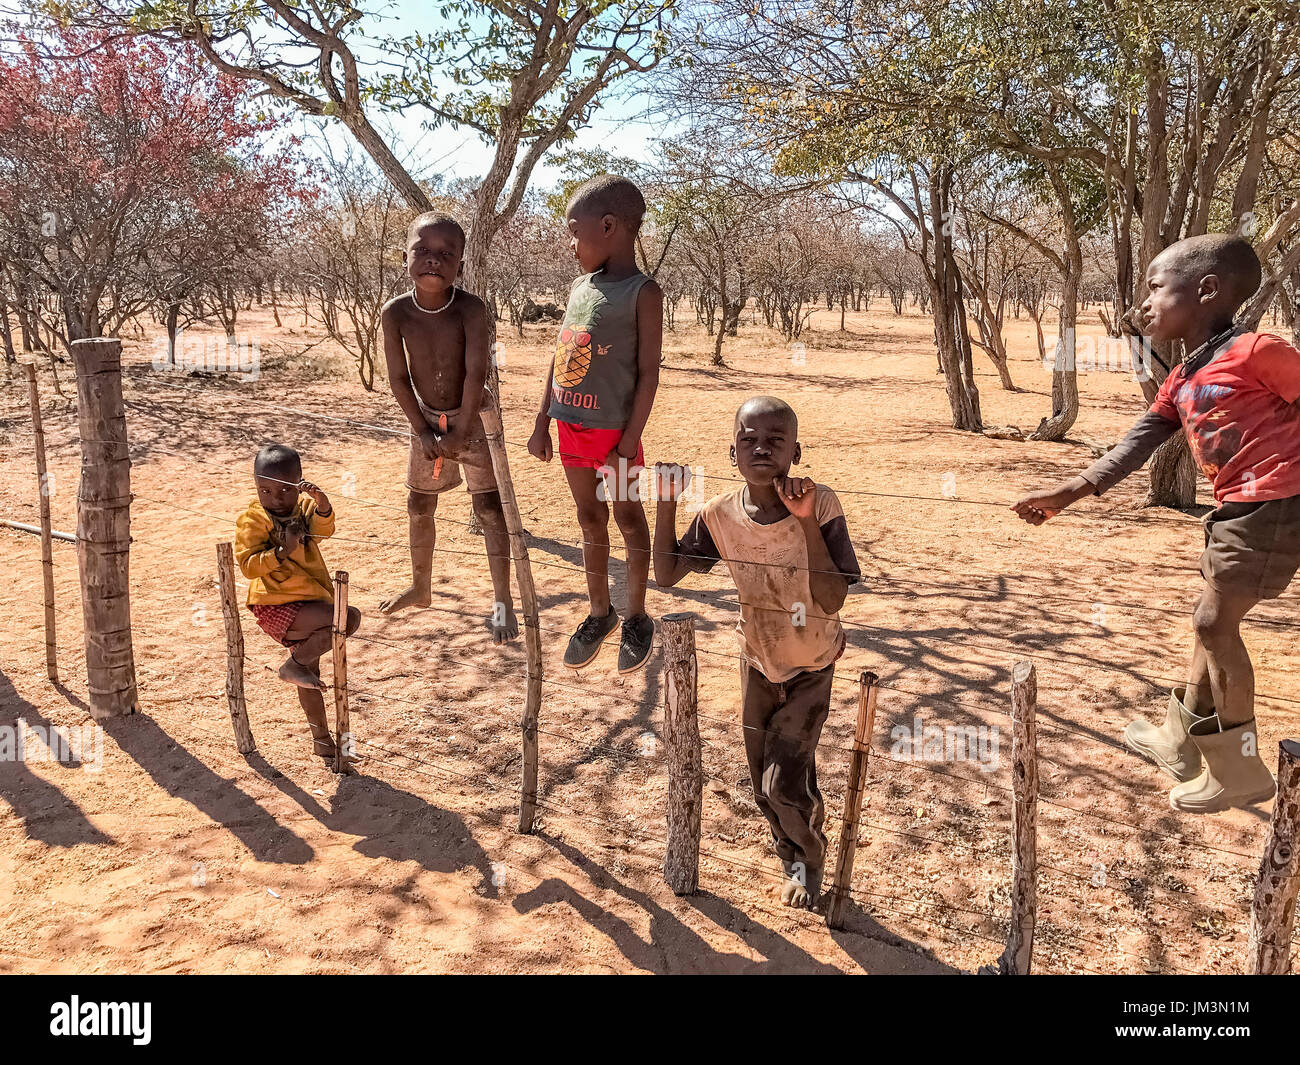 Namibia. Africa. Stock Photo